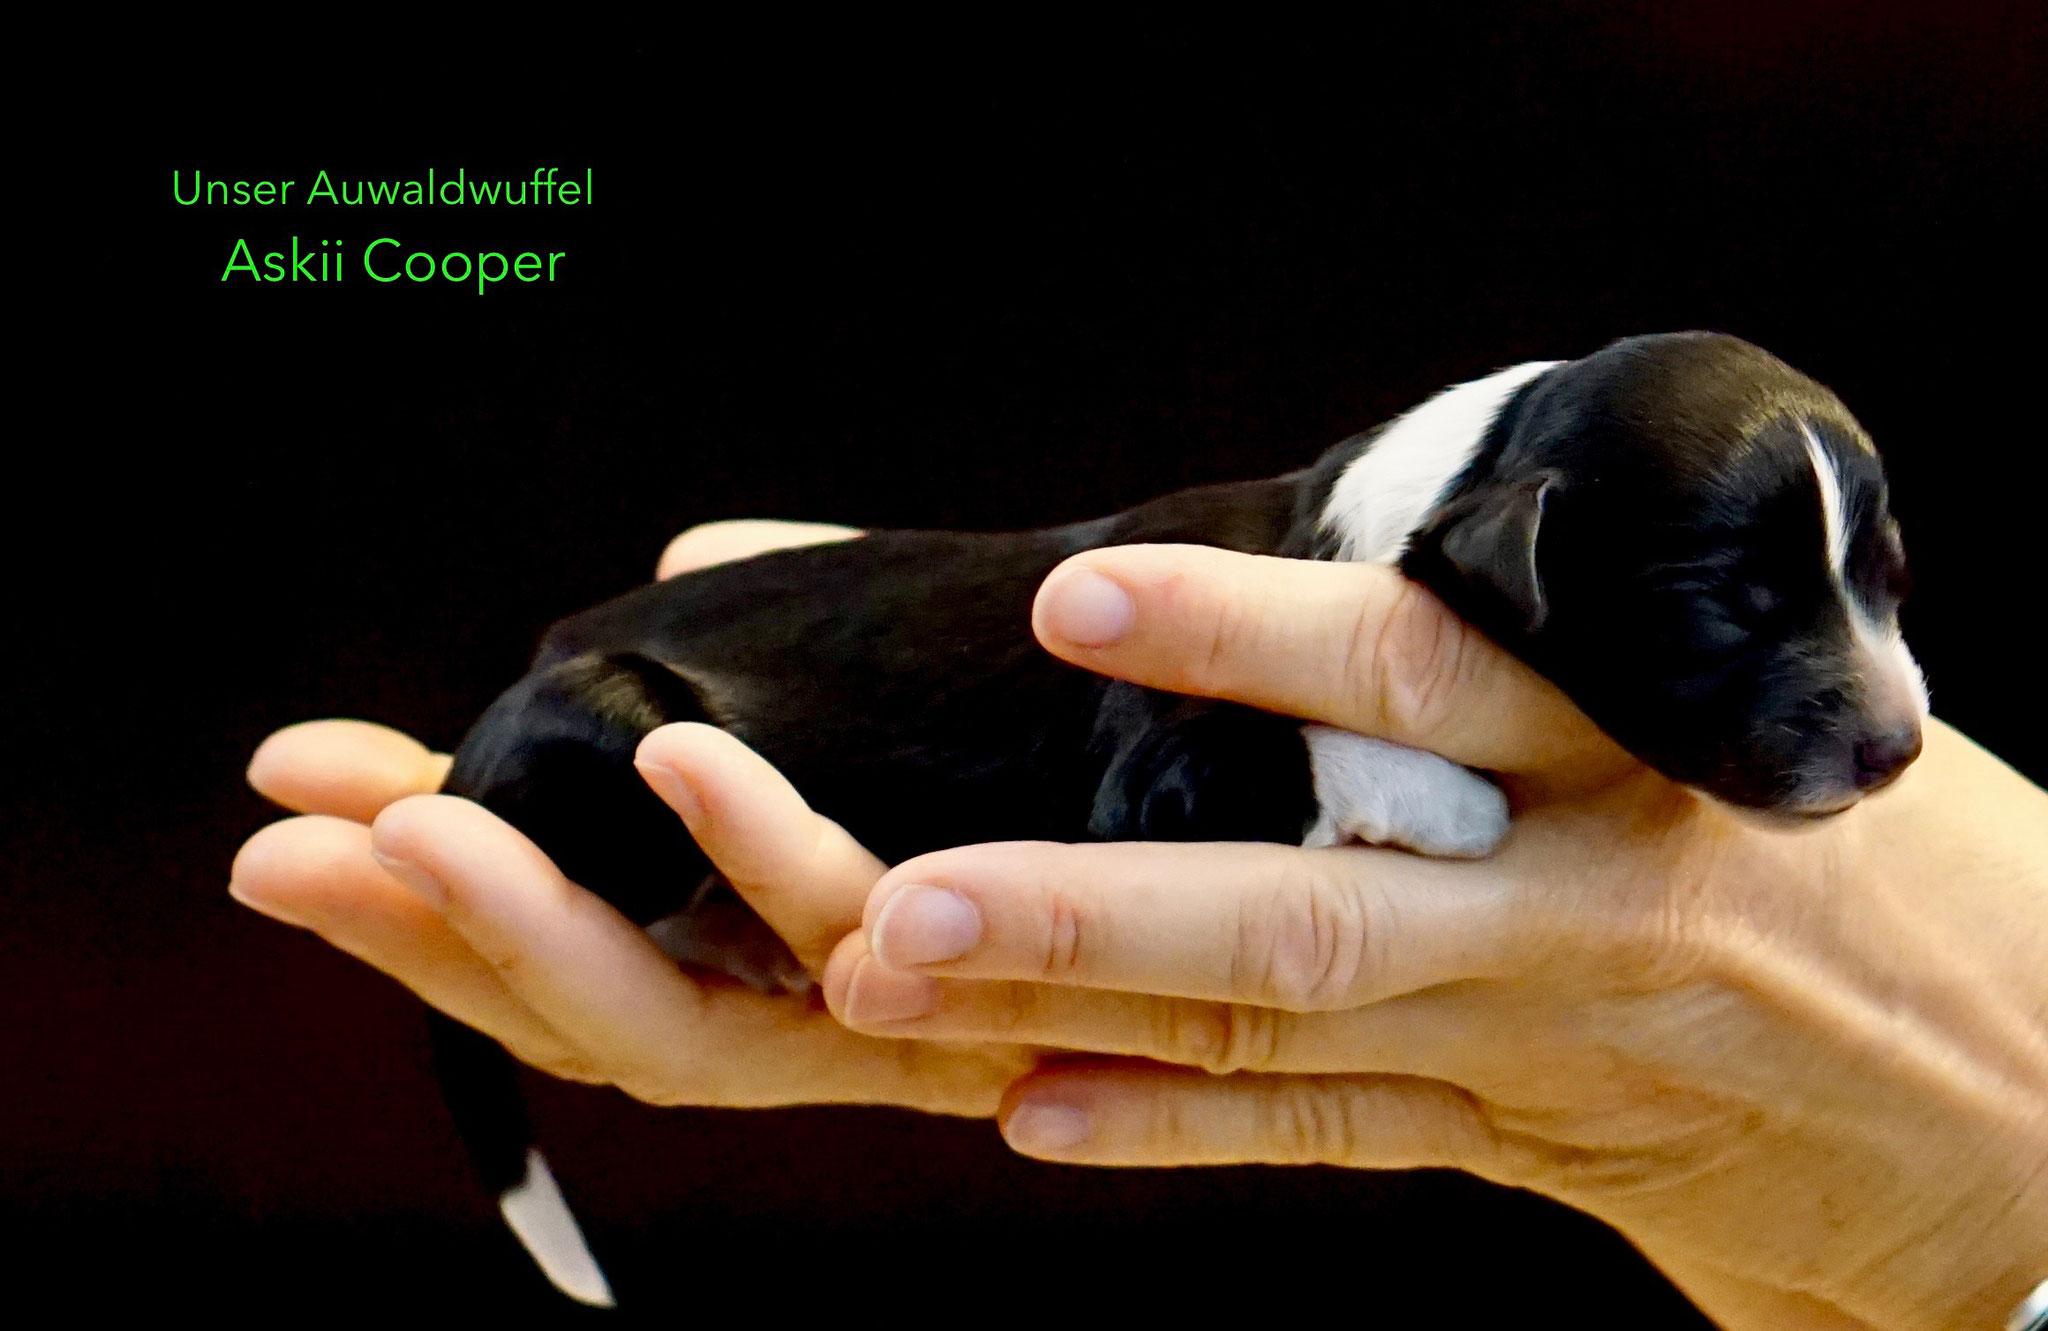 Askii Cooper  (der Junge) - *27.7.2019 14:35 Uhr - 256g